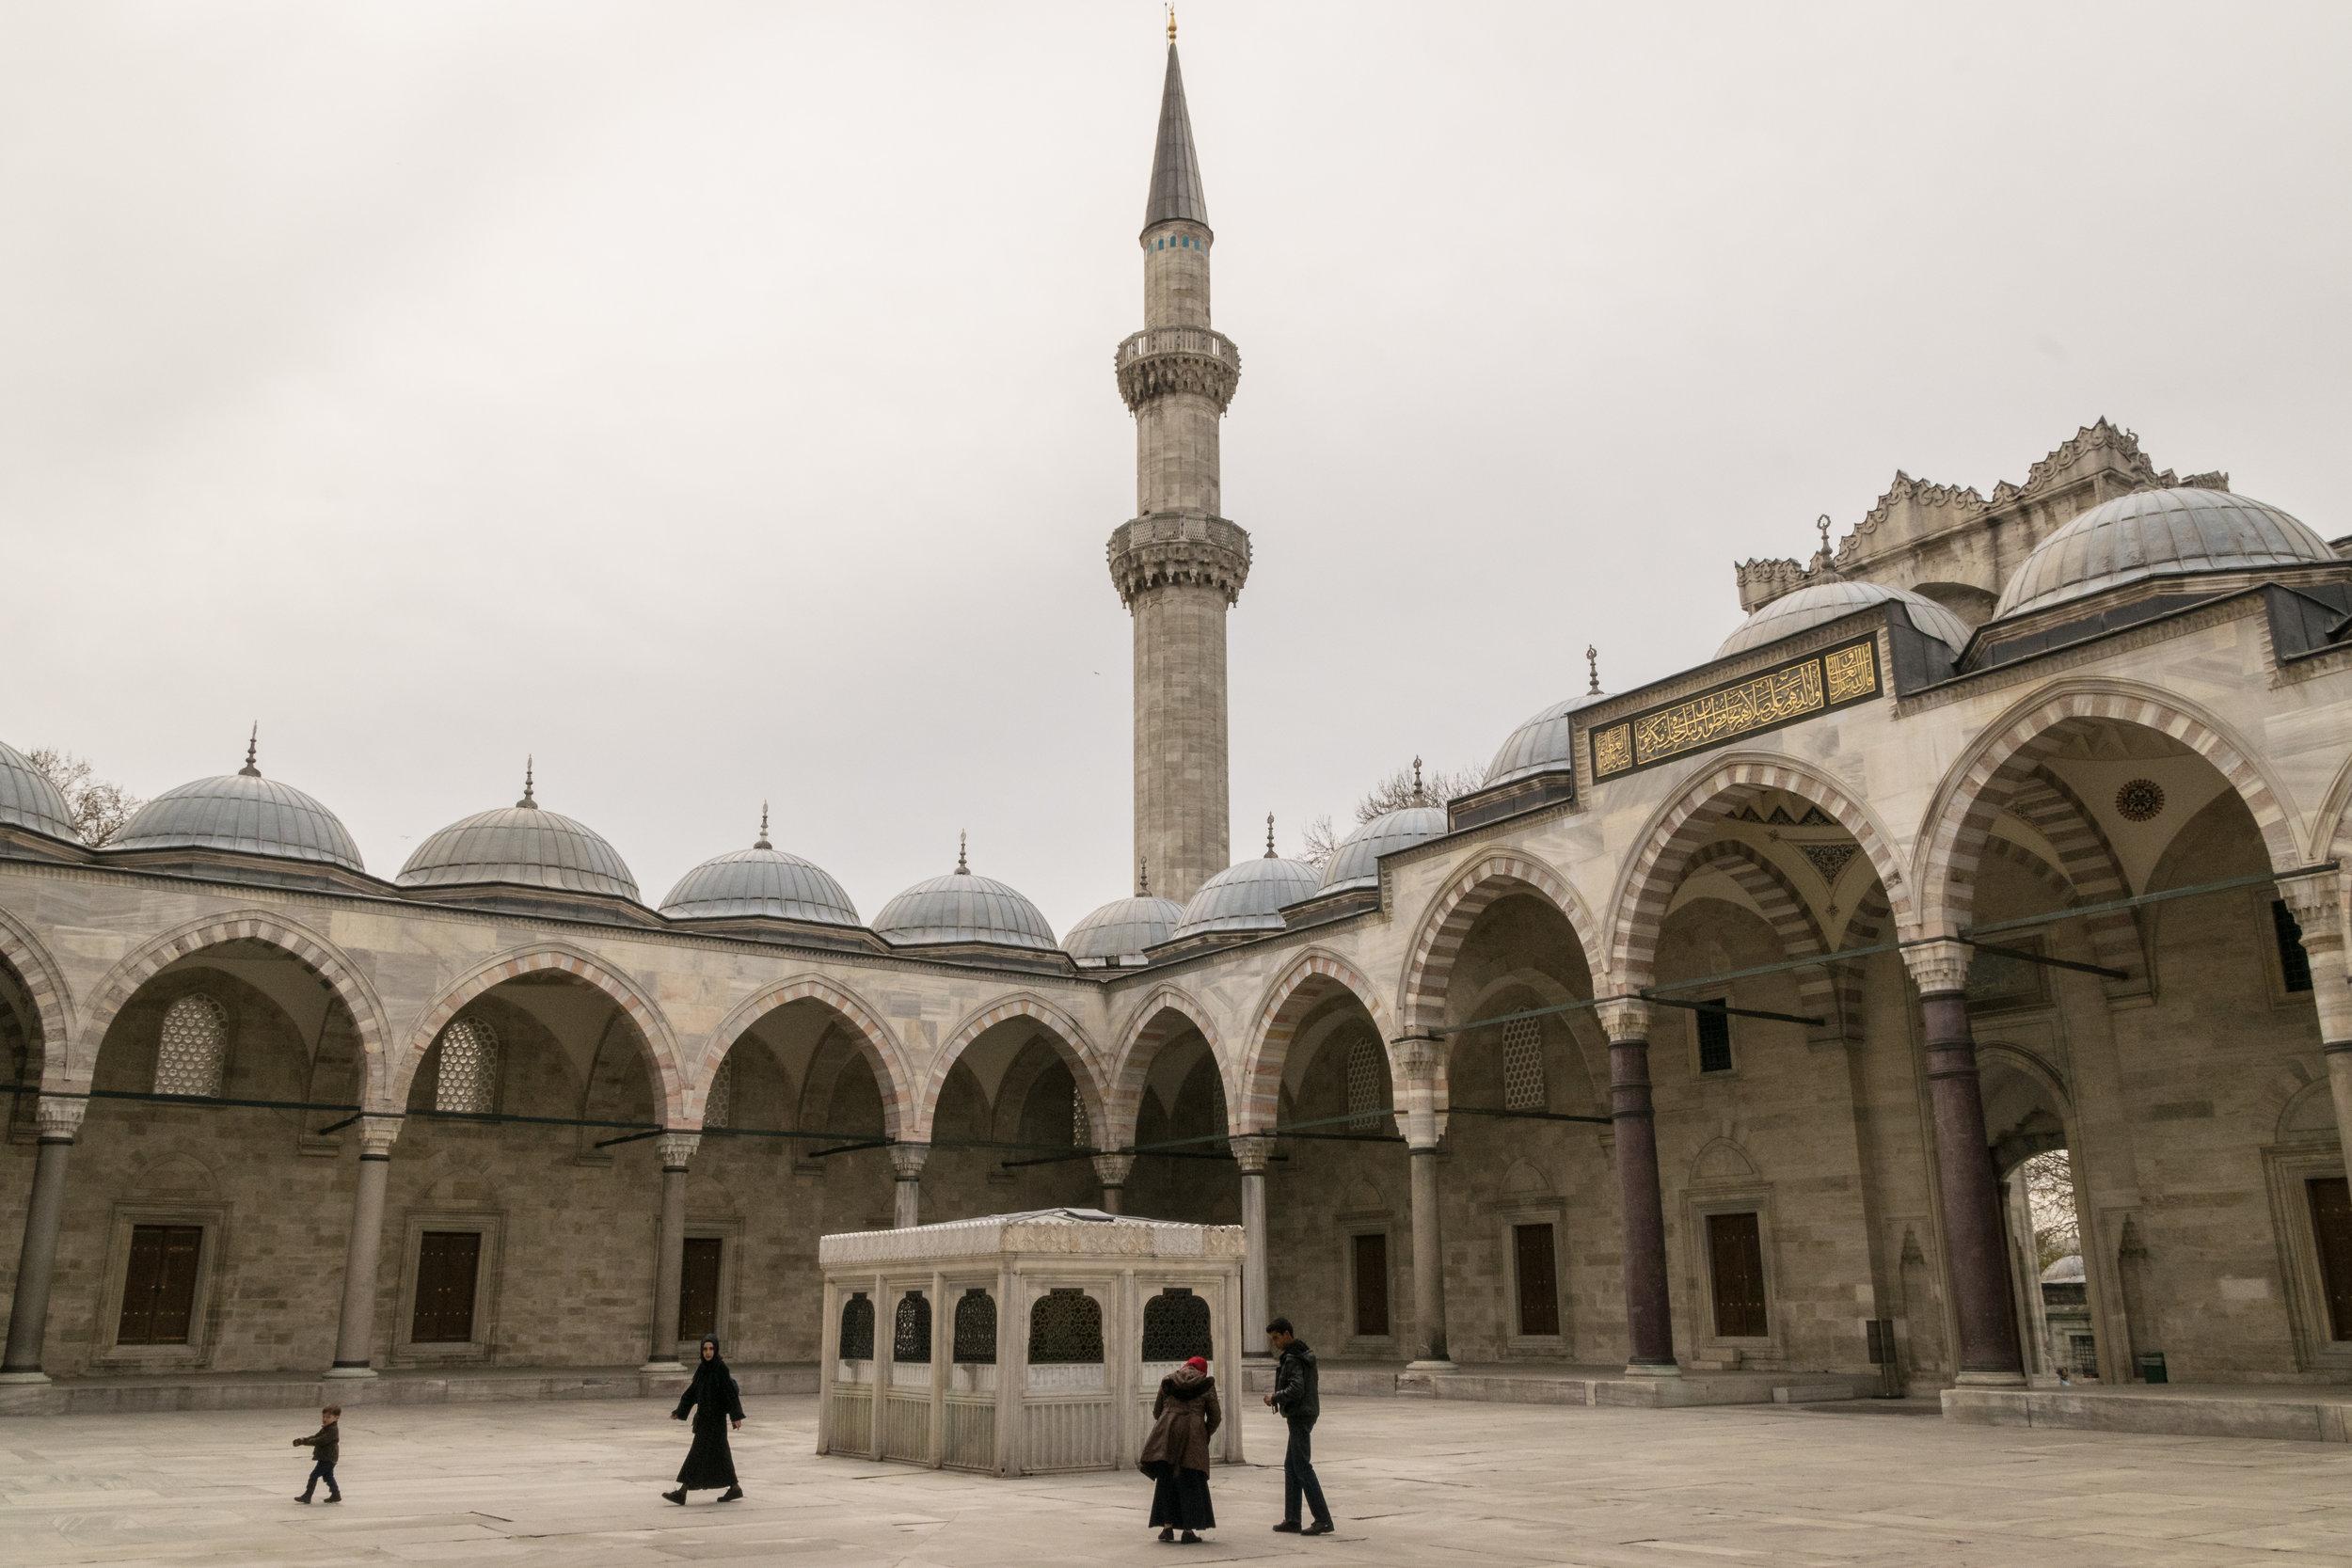 Istanbul UNESCO_Suleymaniye Mosque-3.jpg